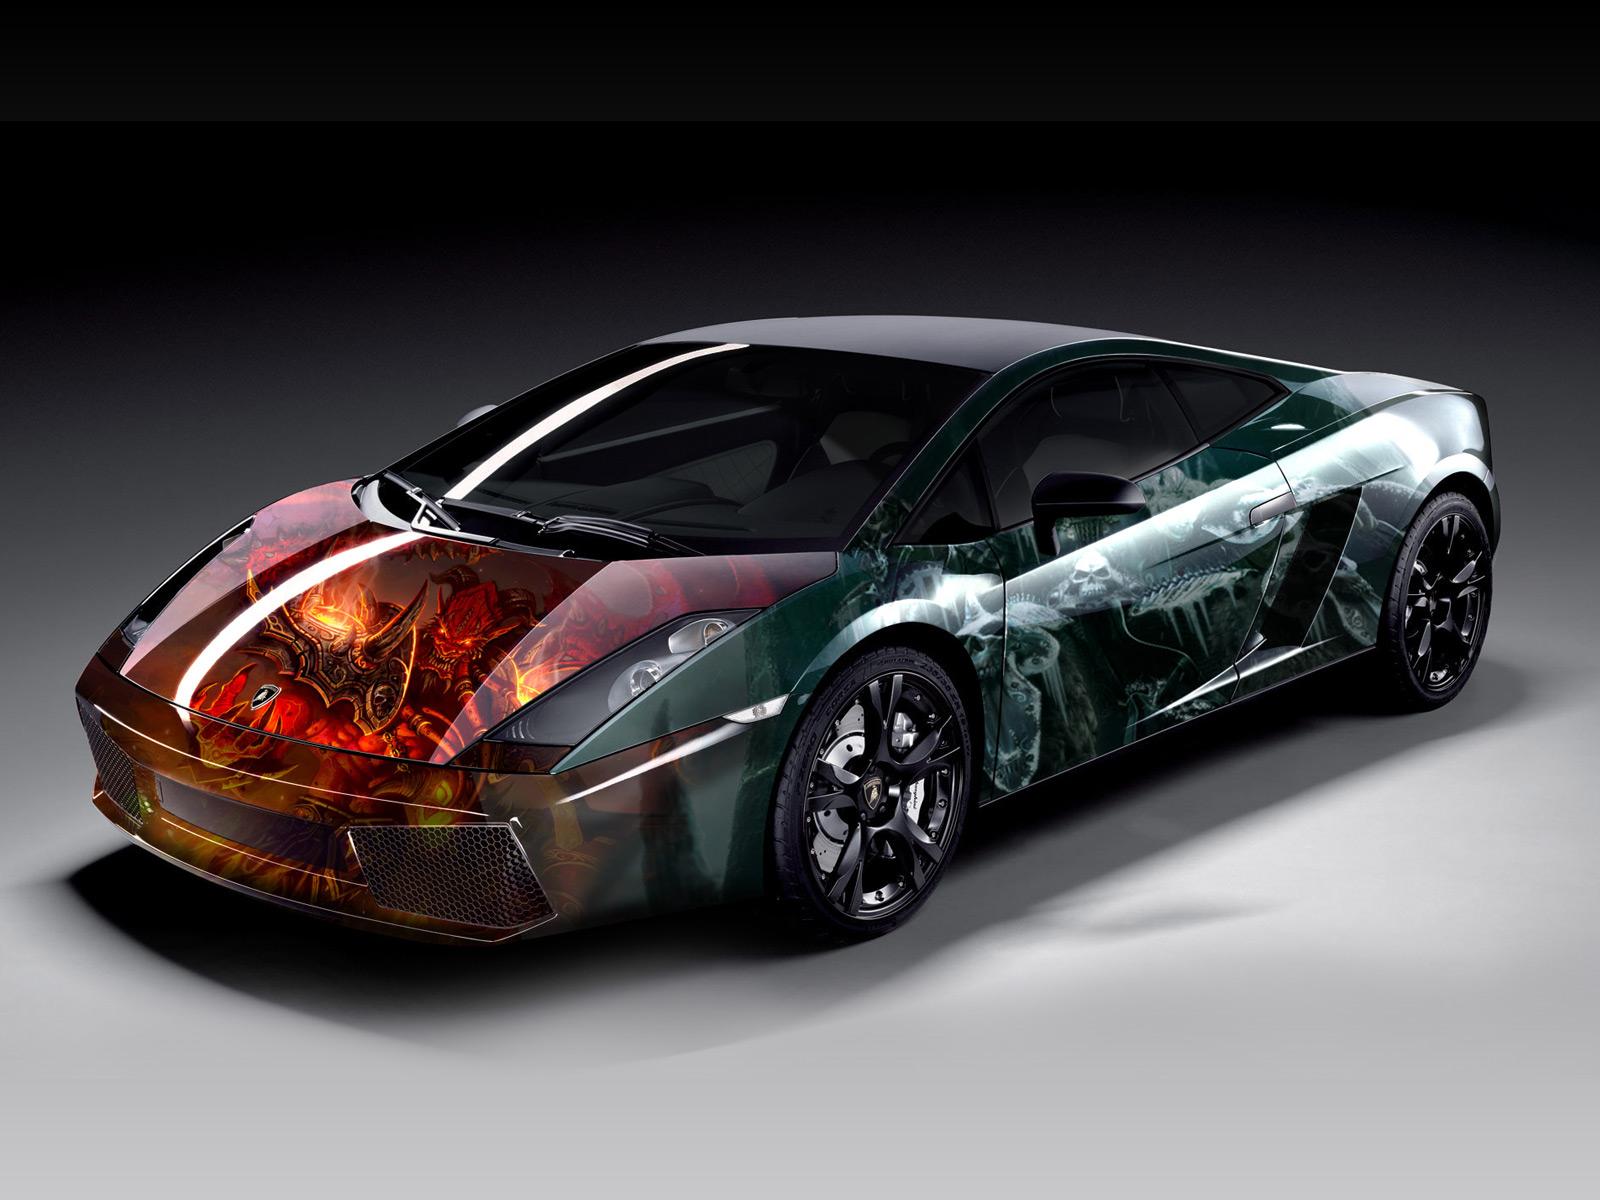 Hd wallpaper vehicle - Hd Wallpaper Vehicle 31